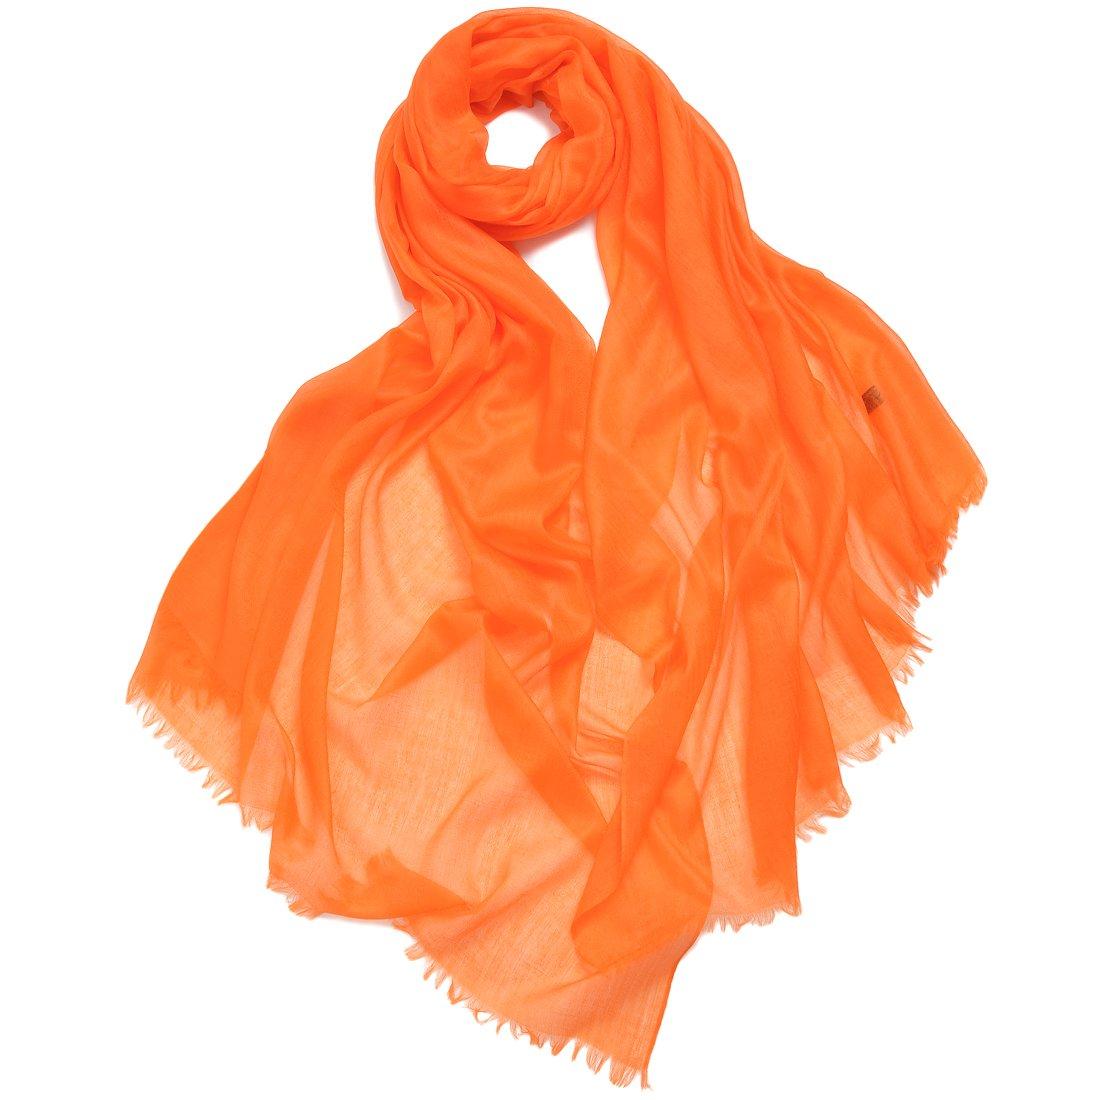 ZORJAR Pure Cashmere Scarf Women Ultra Thin Pashmina Shawls and Wraps 39''x94''(Orange)